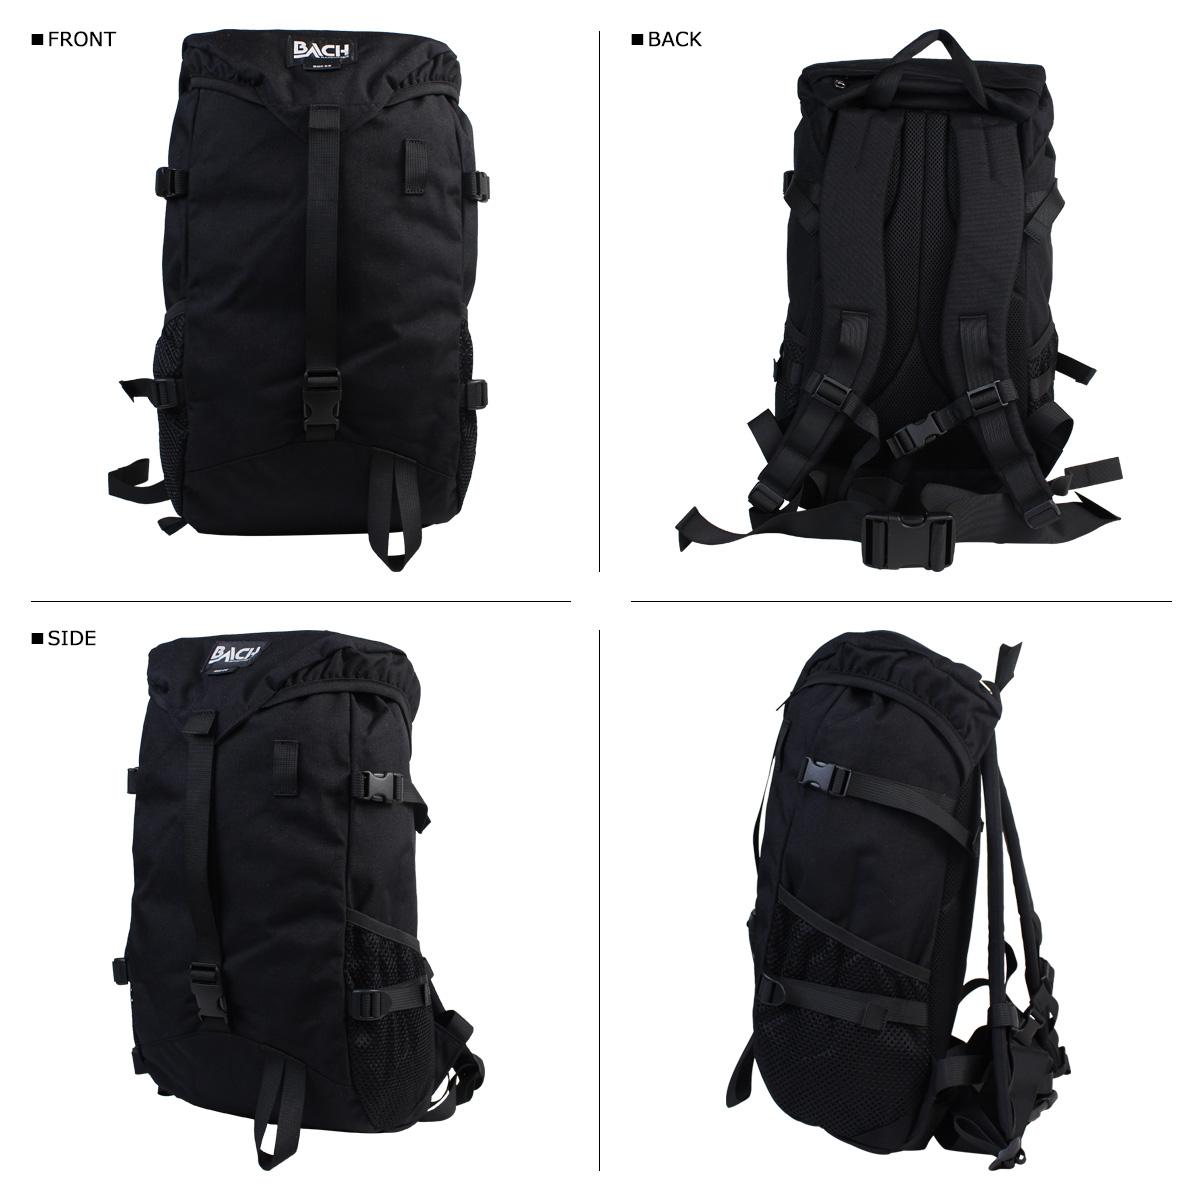 Bach backpack 22L BACH rucksack ROC 22 コーデュラ 122001 lady's men's black [3/16 Shinnyu load]